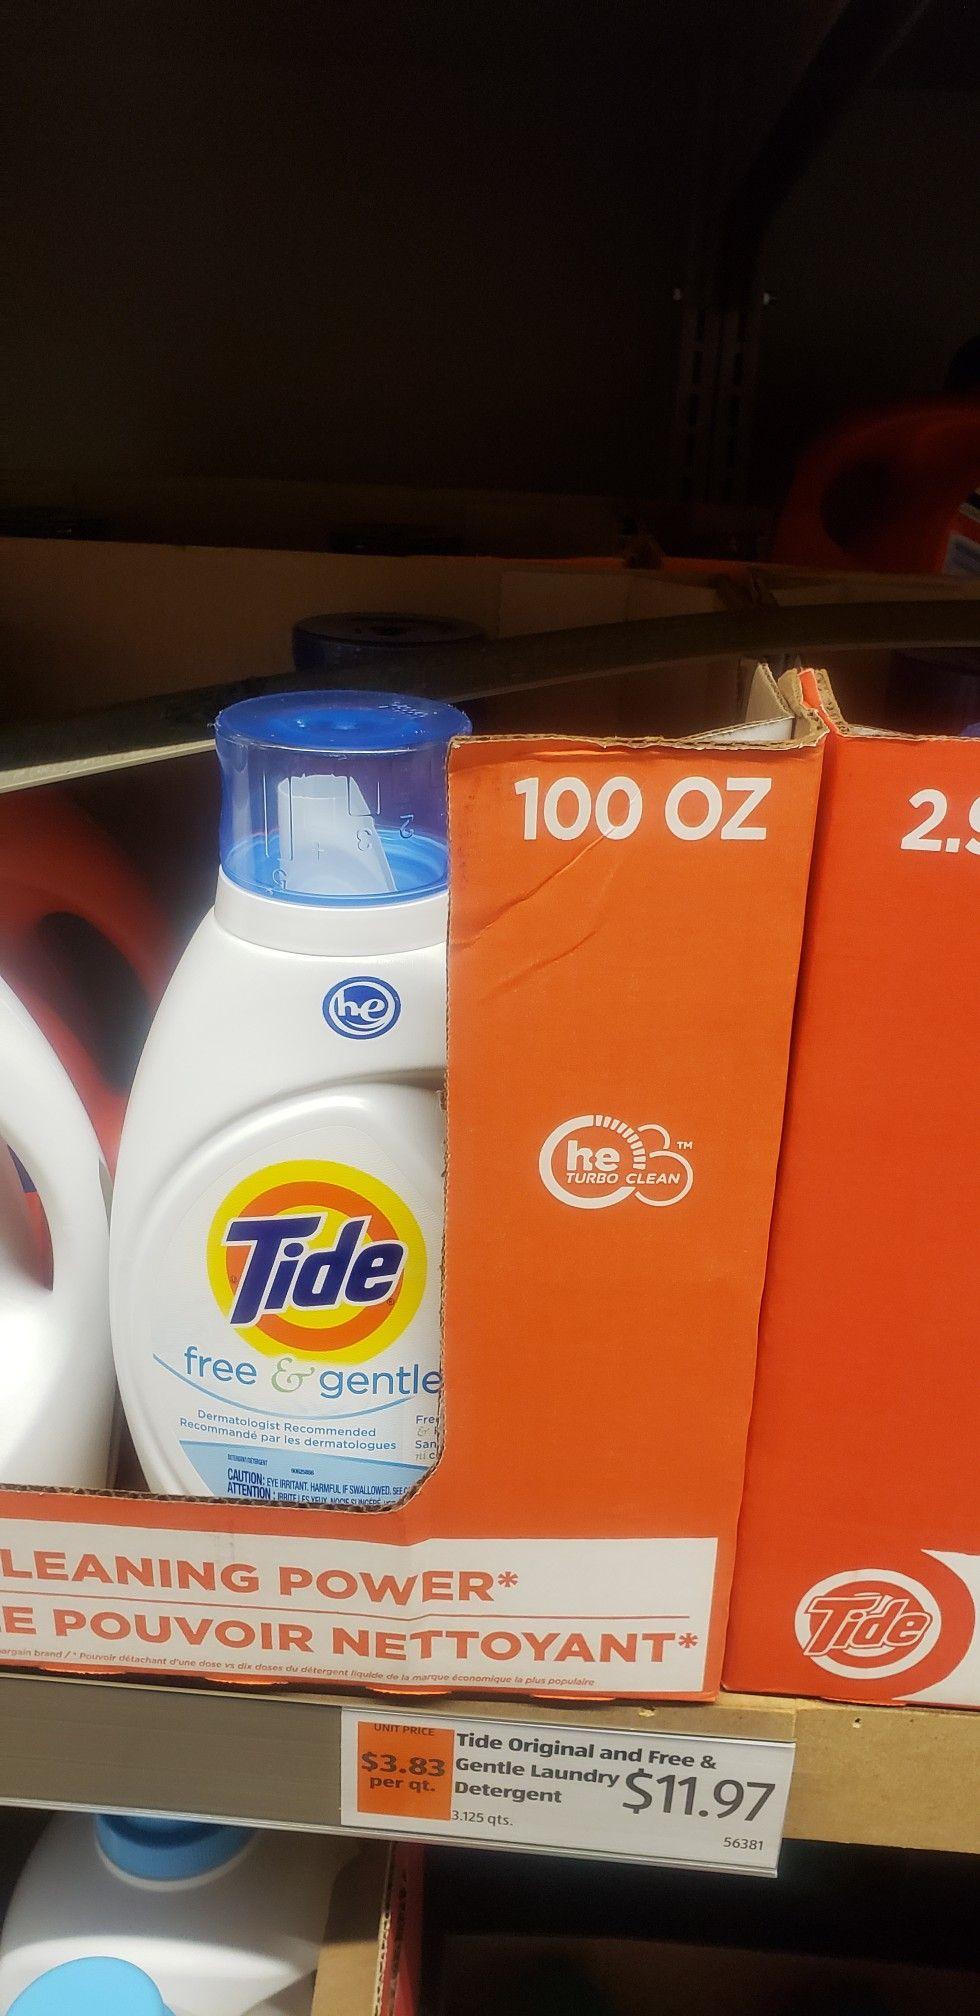 Tide 100oz 11 97 Aldi Pricelist Gentle Laundry Detergent